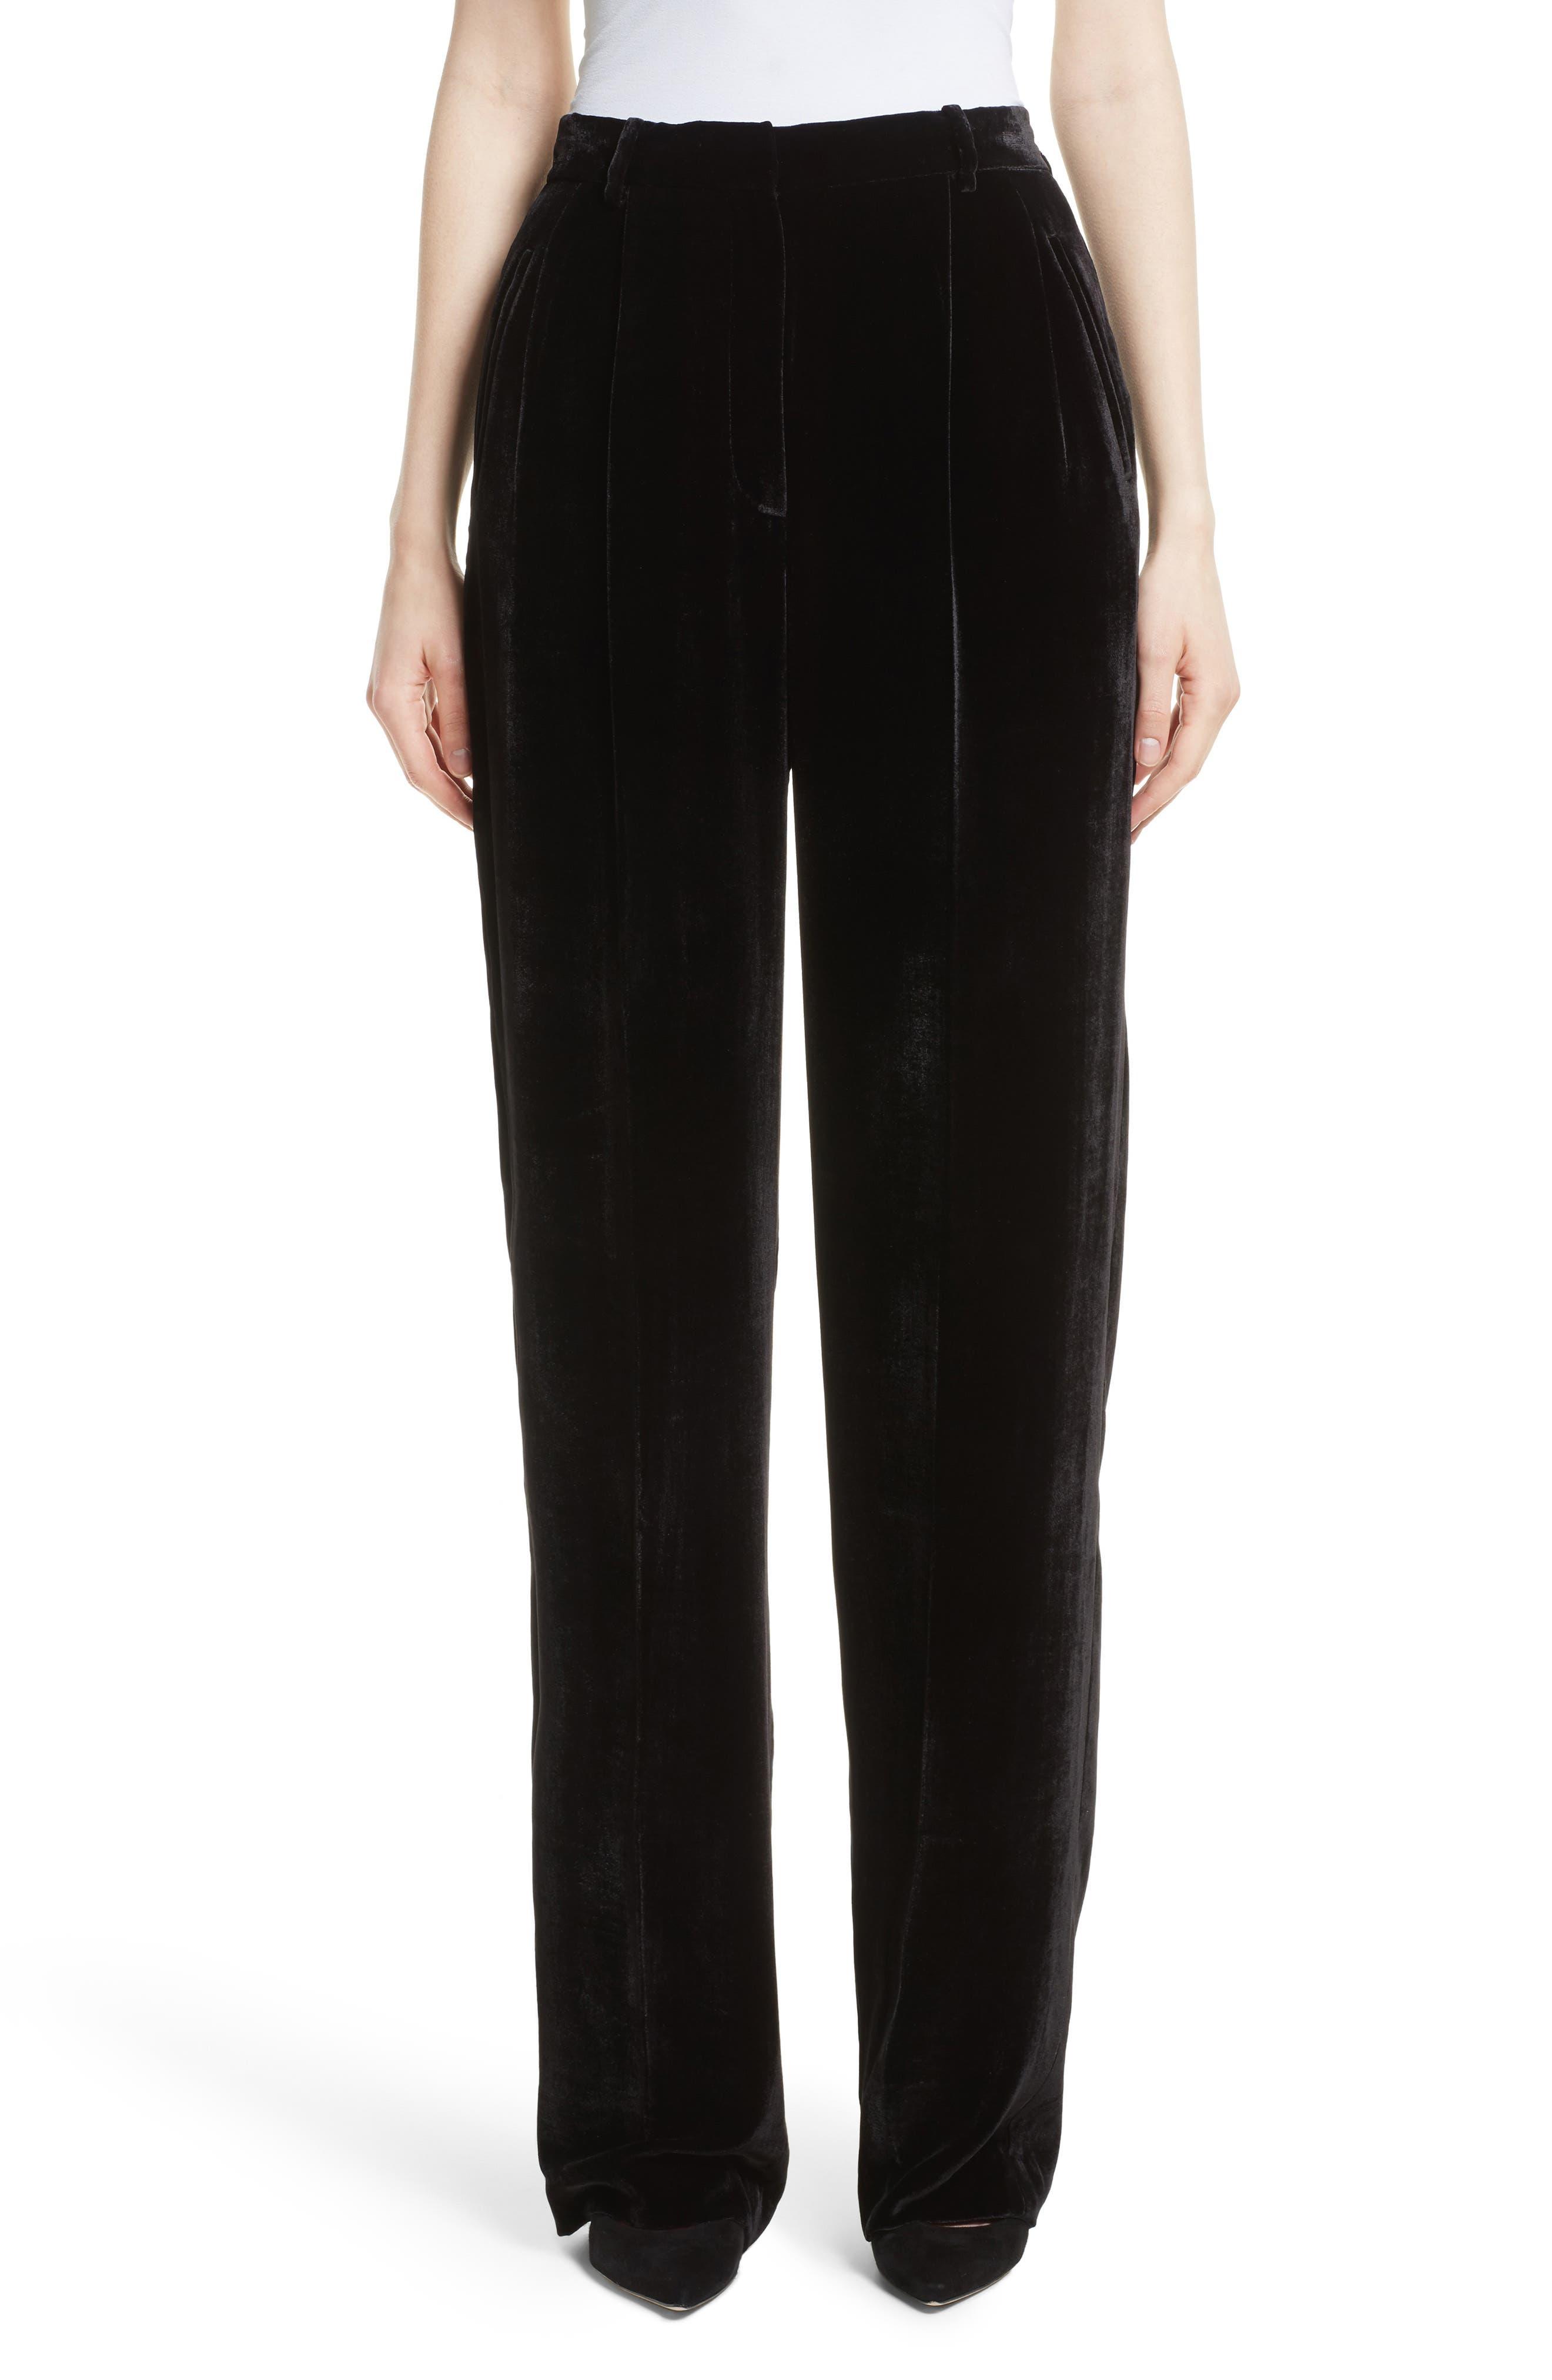 Main Image - Theory High Waist Luxe Velvet Pants